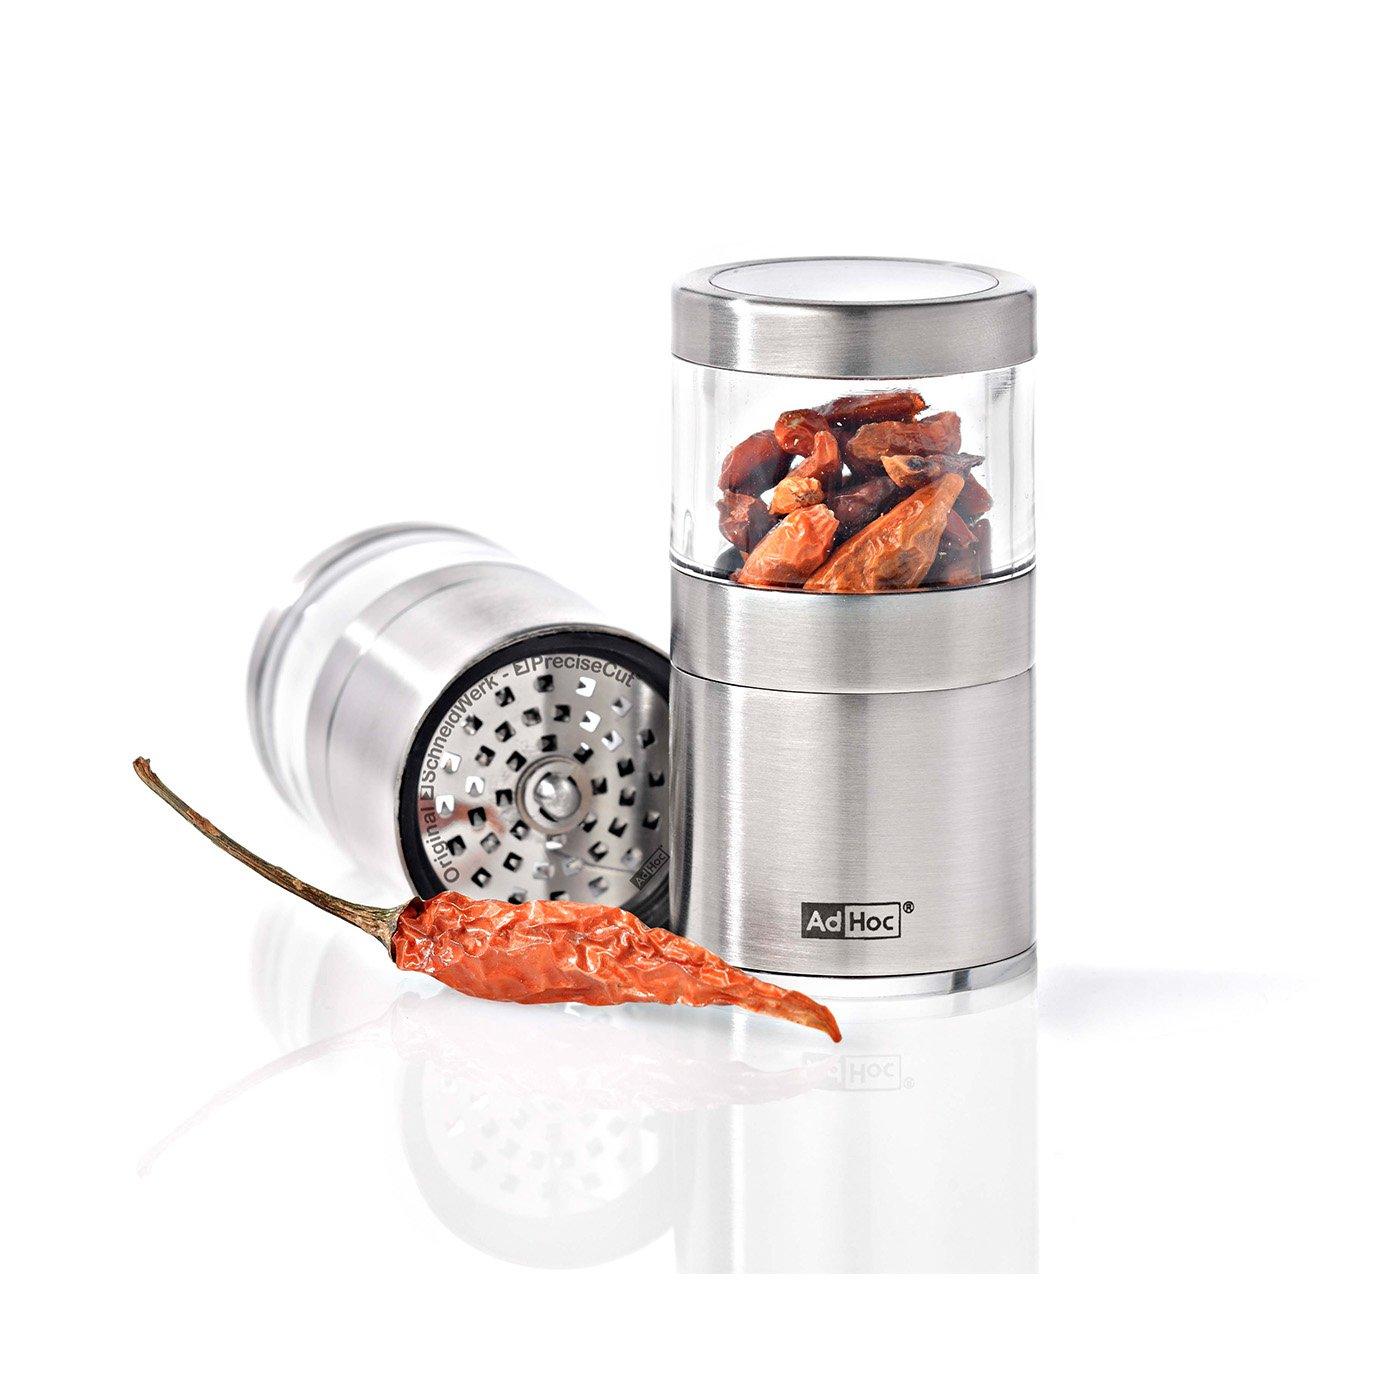 AdHoc Voyage 1.5 Inch Mini Chili and Herb Cutter